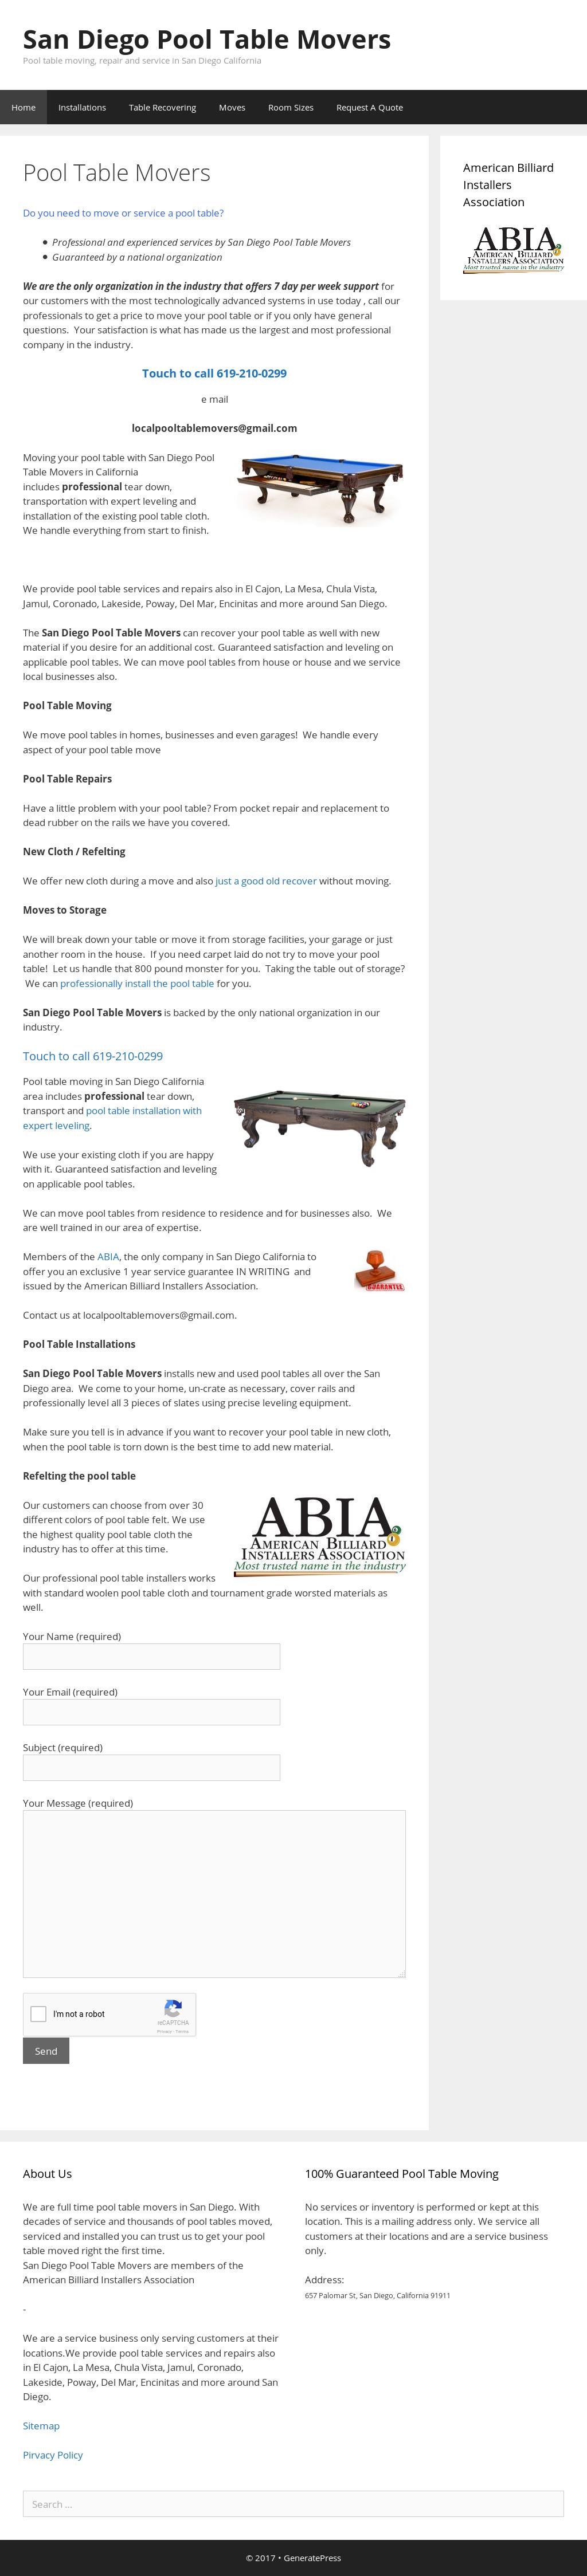 Incroyable San Diego Pool Table Movers Website History